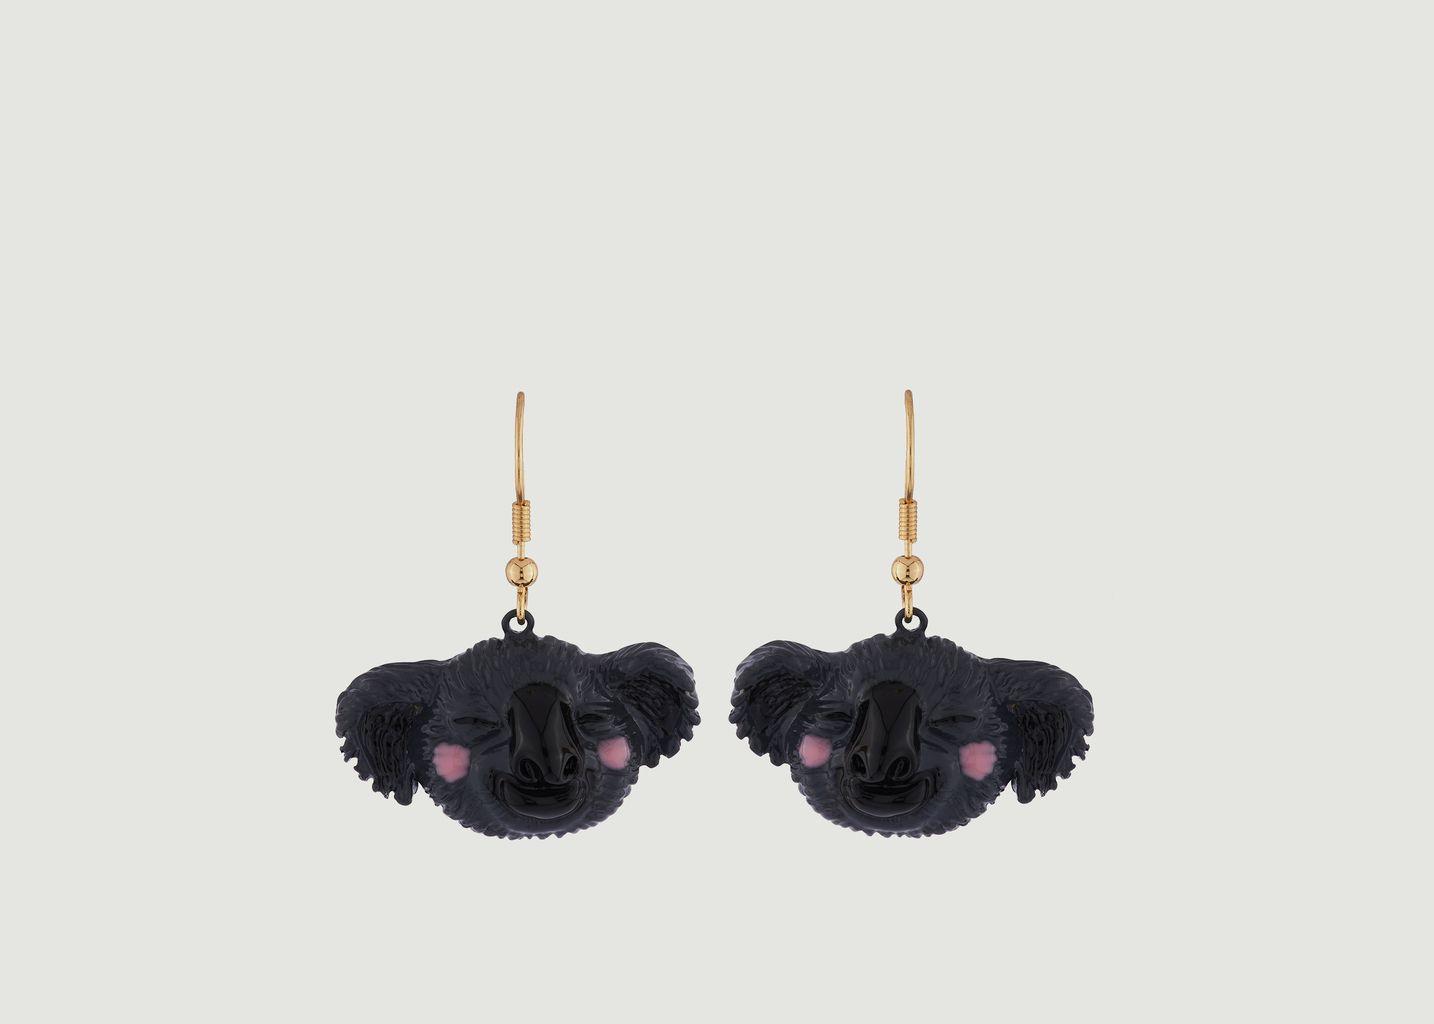 Boucles d'Oreilles Koala Malicieux  - N2